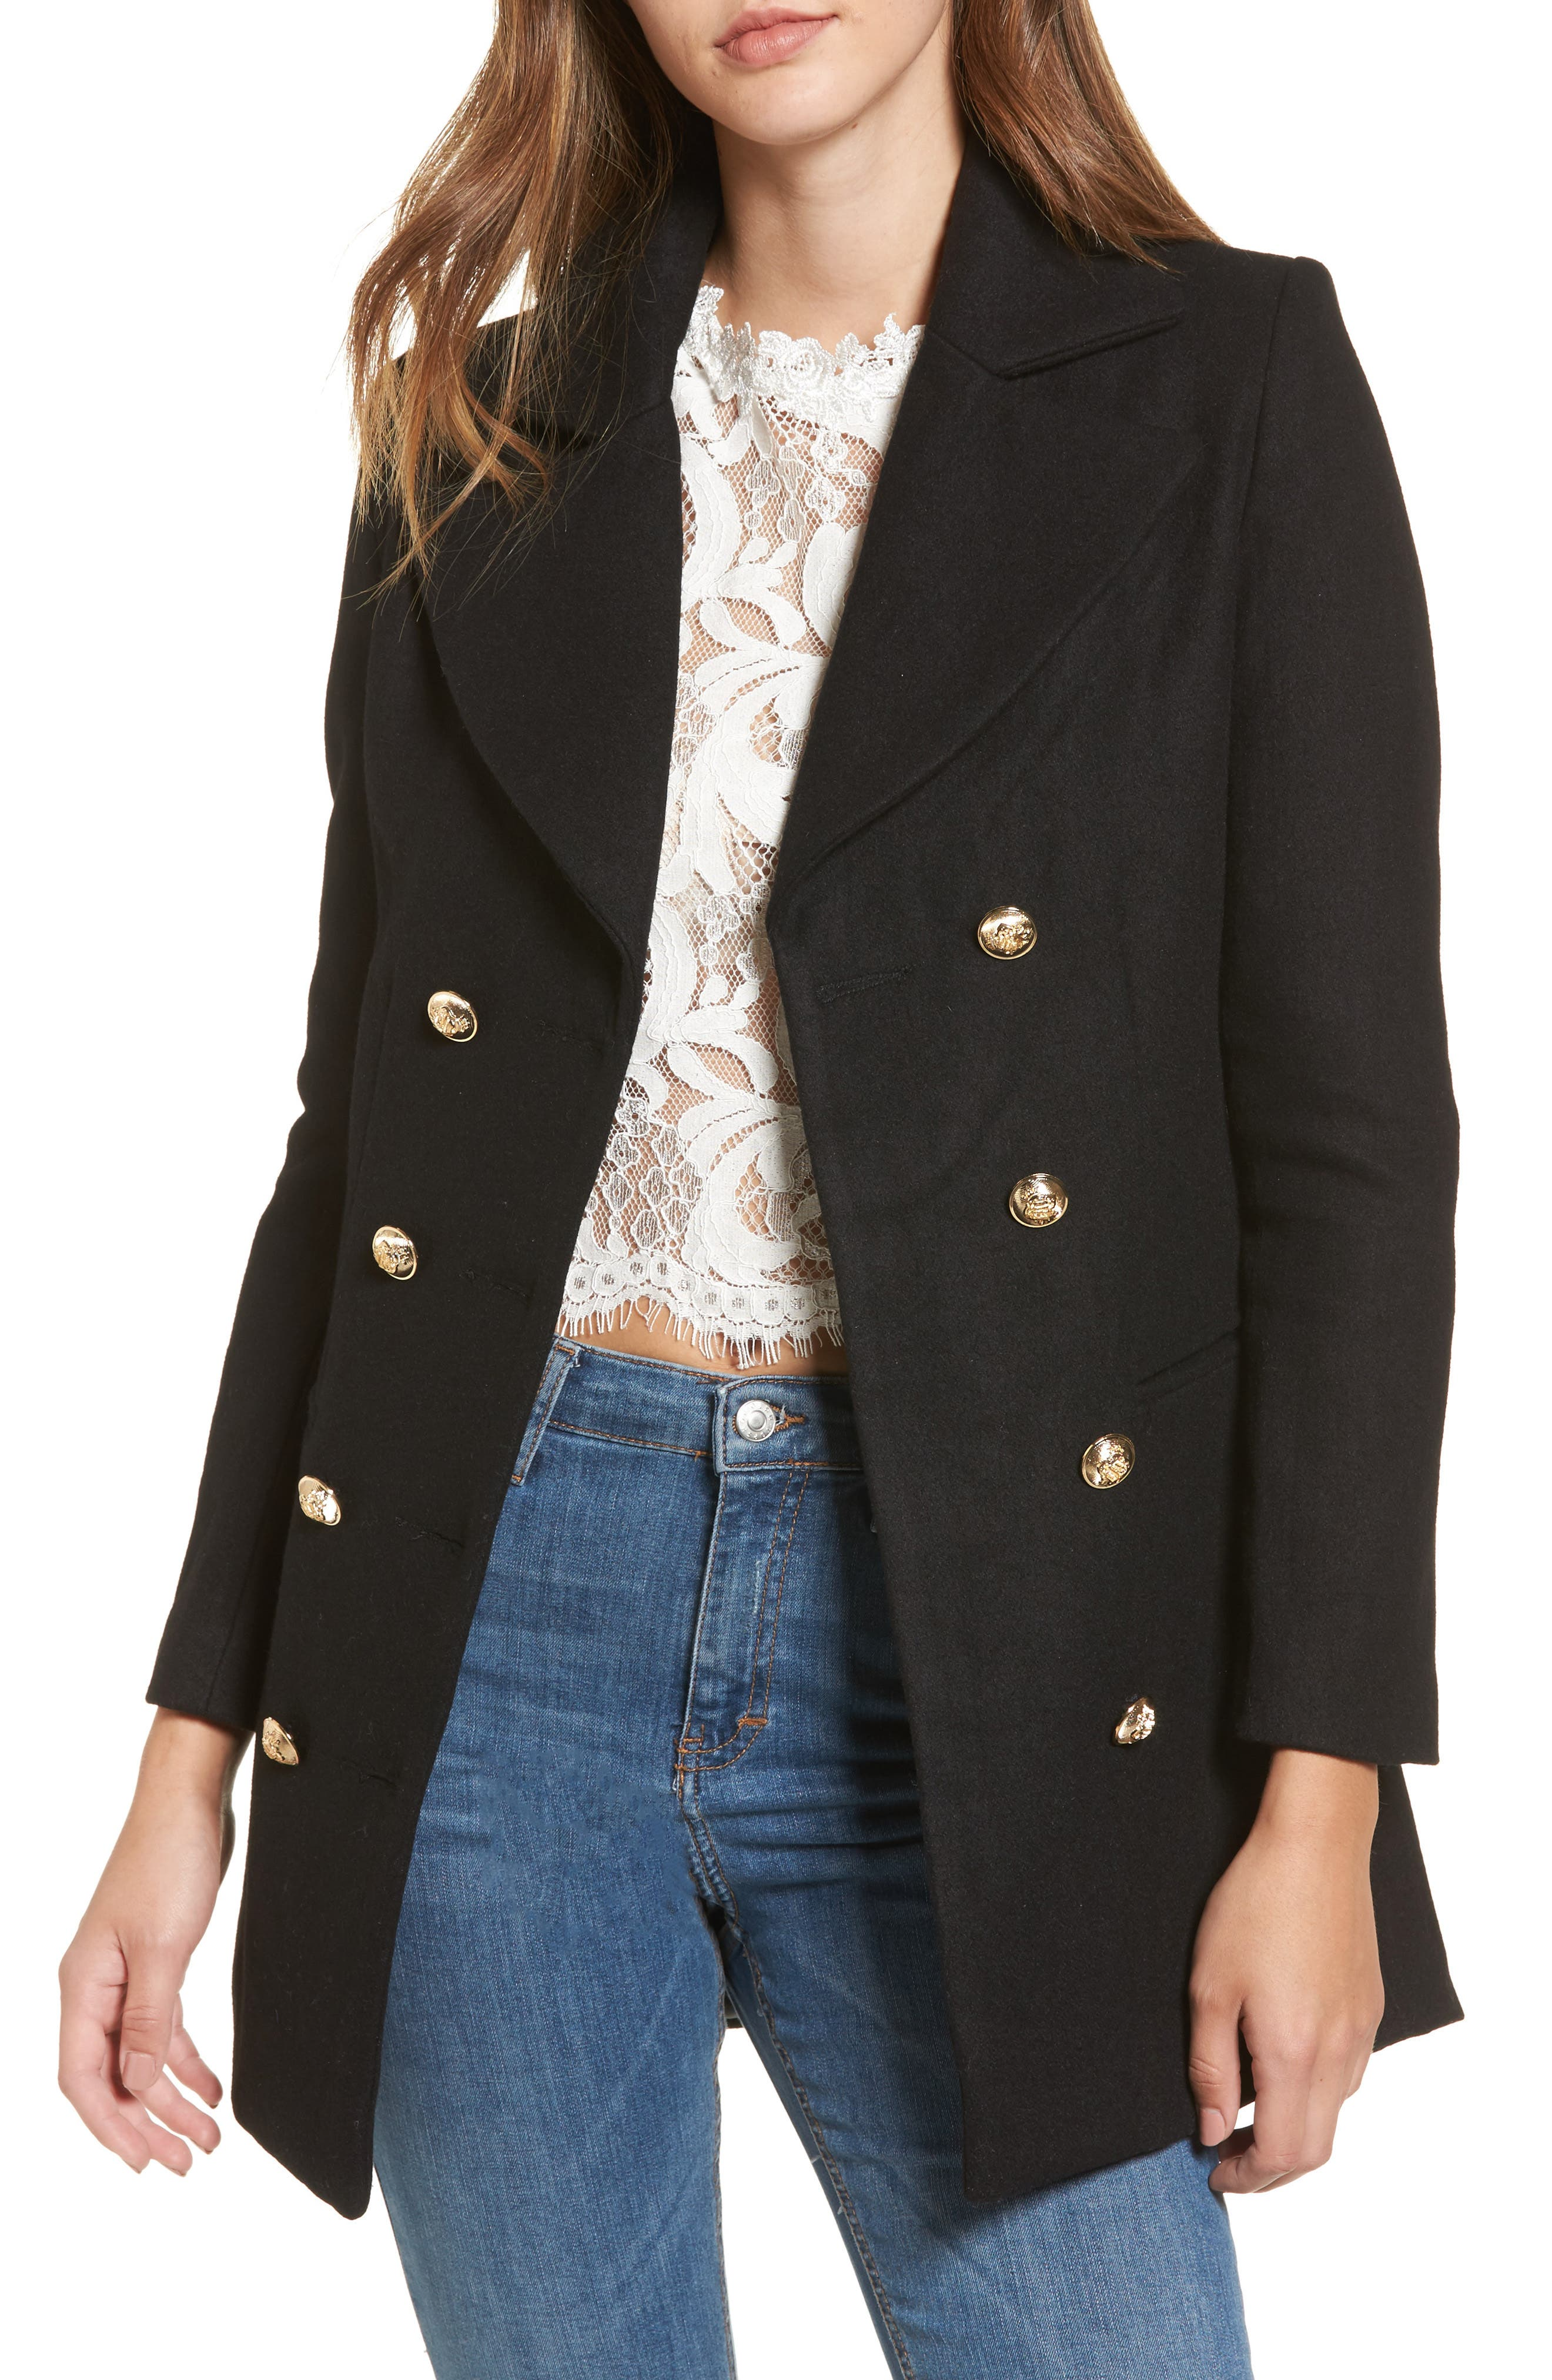 Alternate Image 1 Selected - Lioness Bad Romance Blazer Jacket